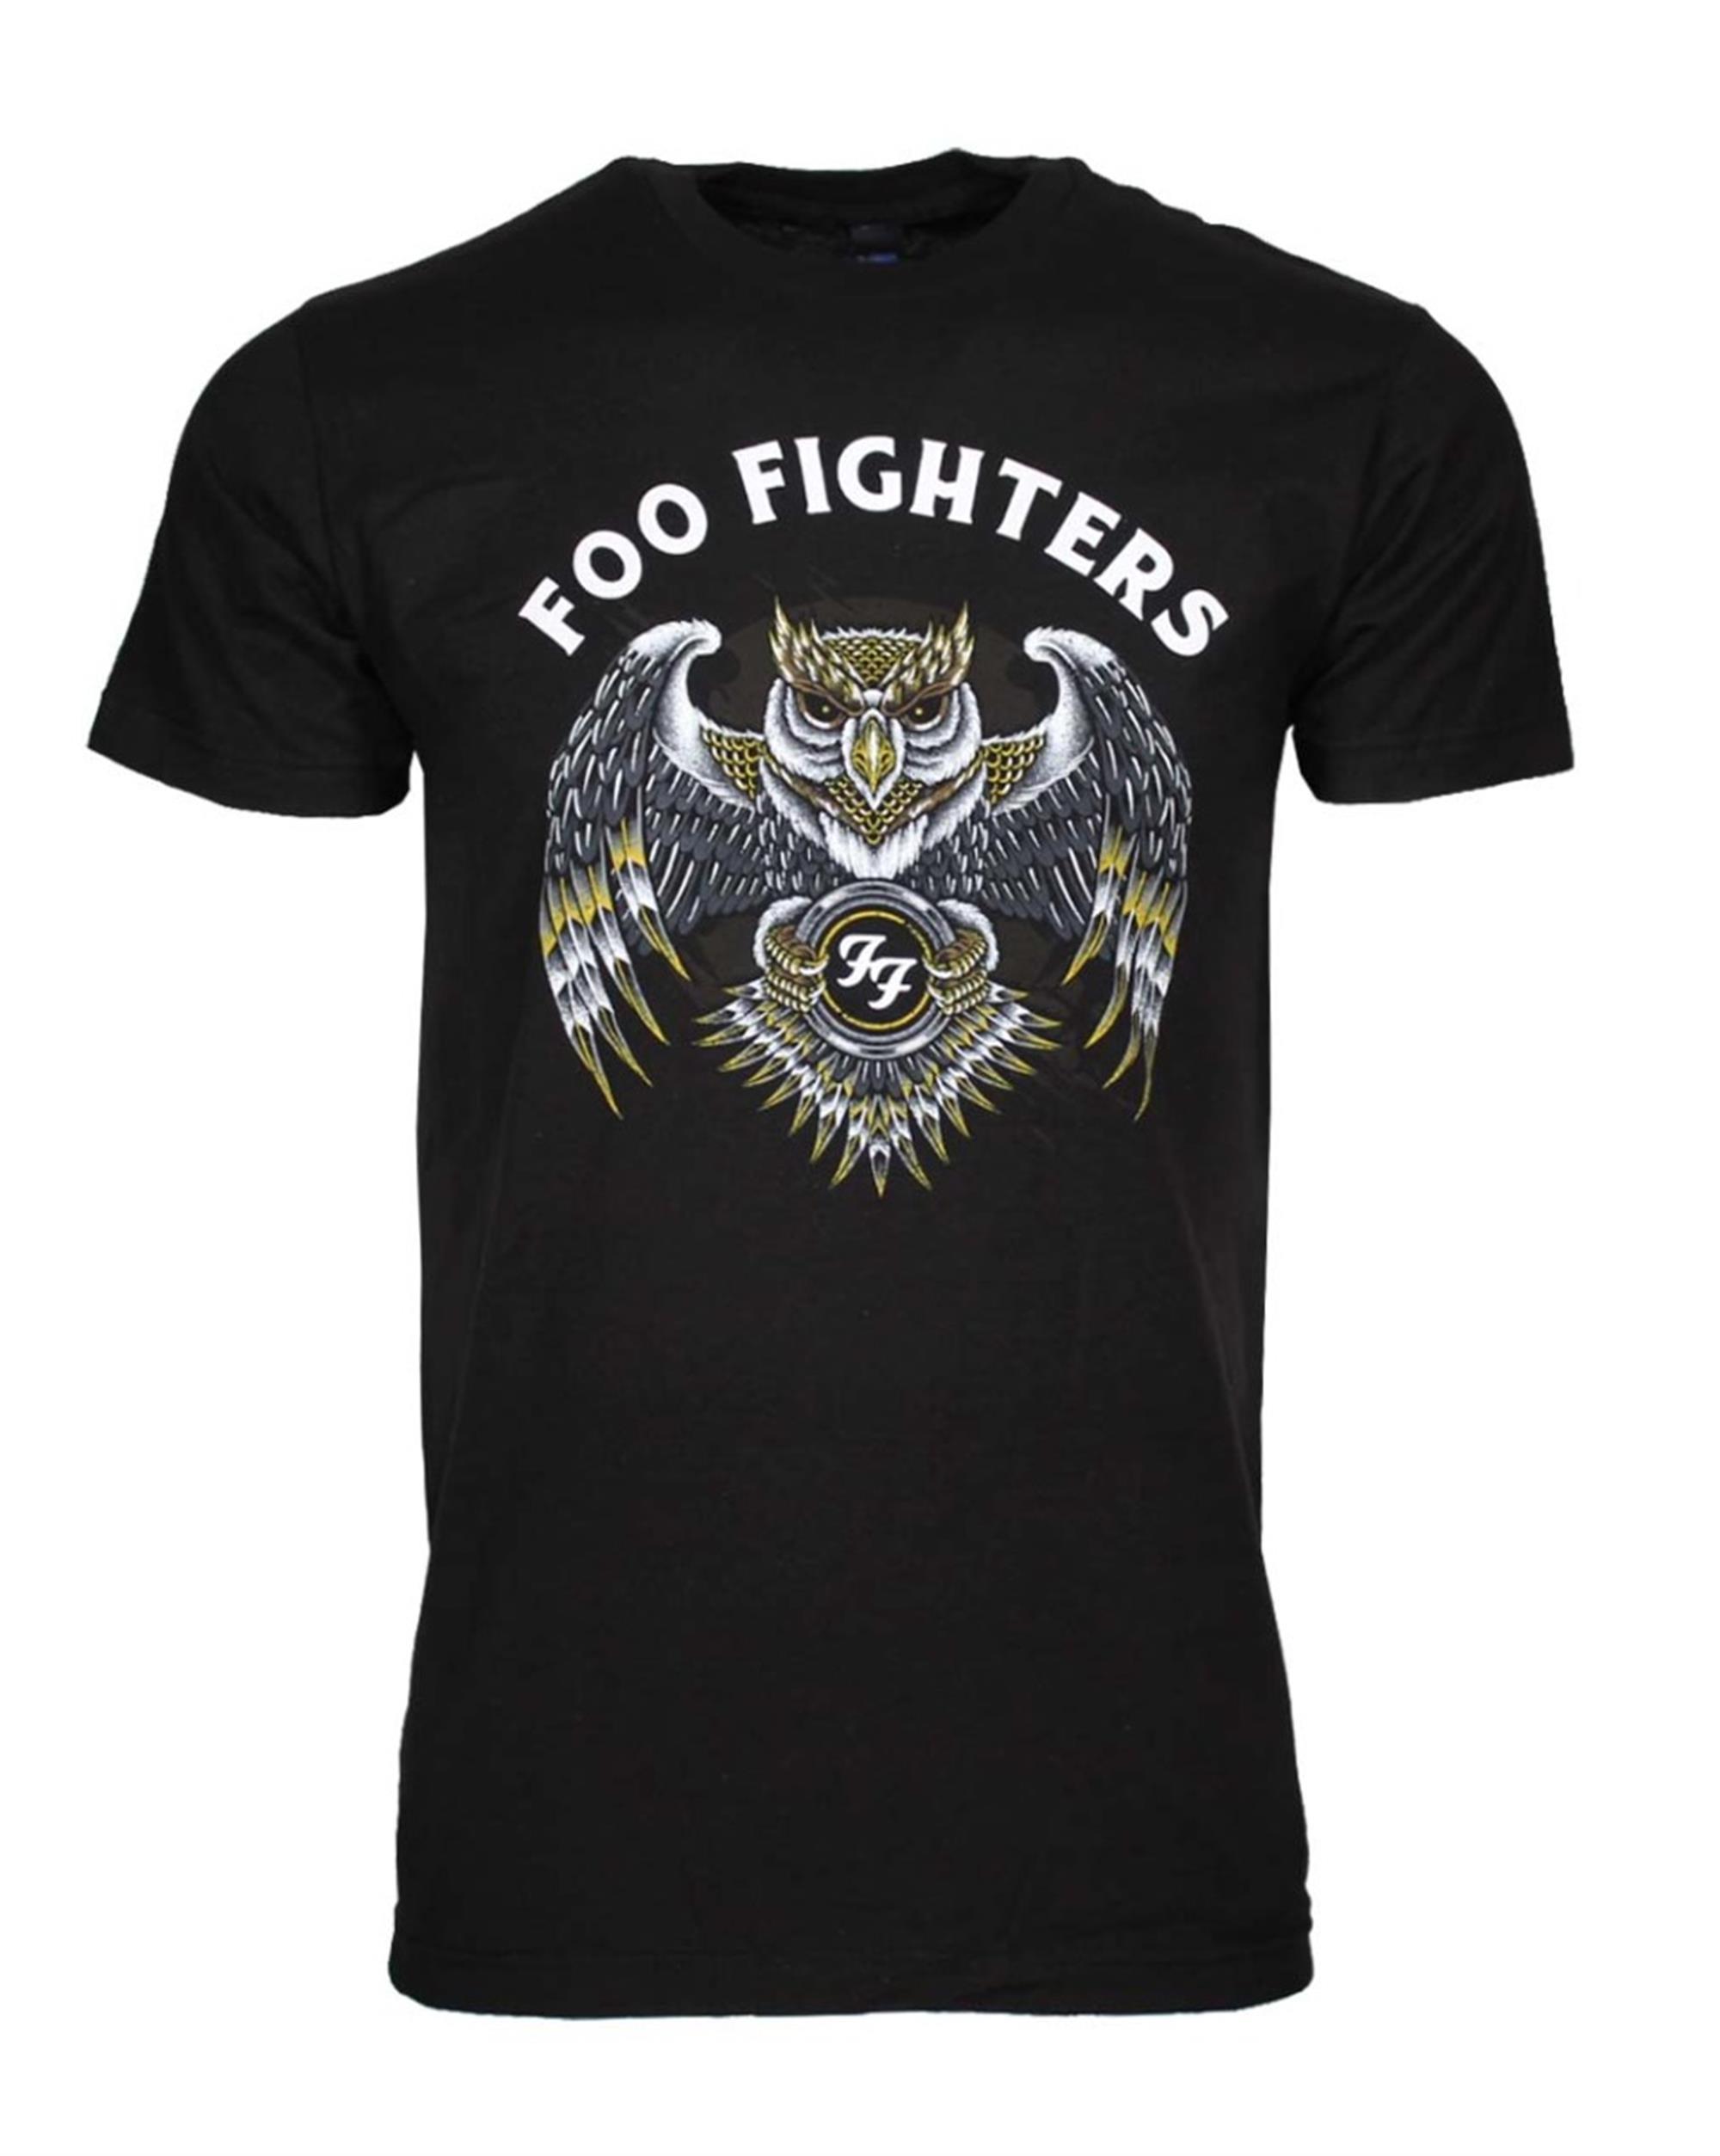 Foo Fighters Owl T-Shirt